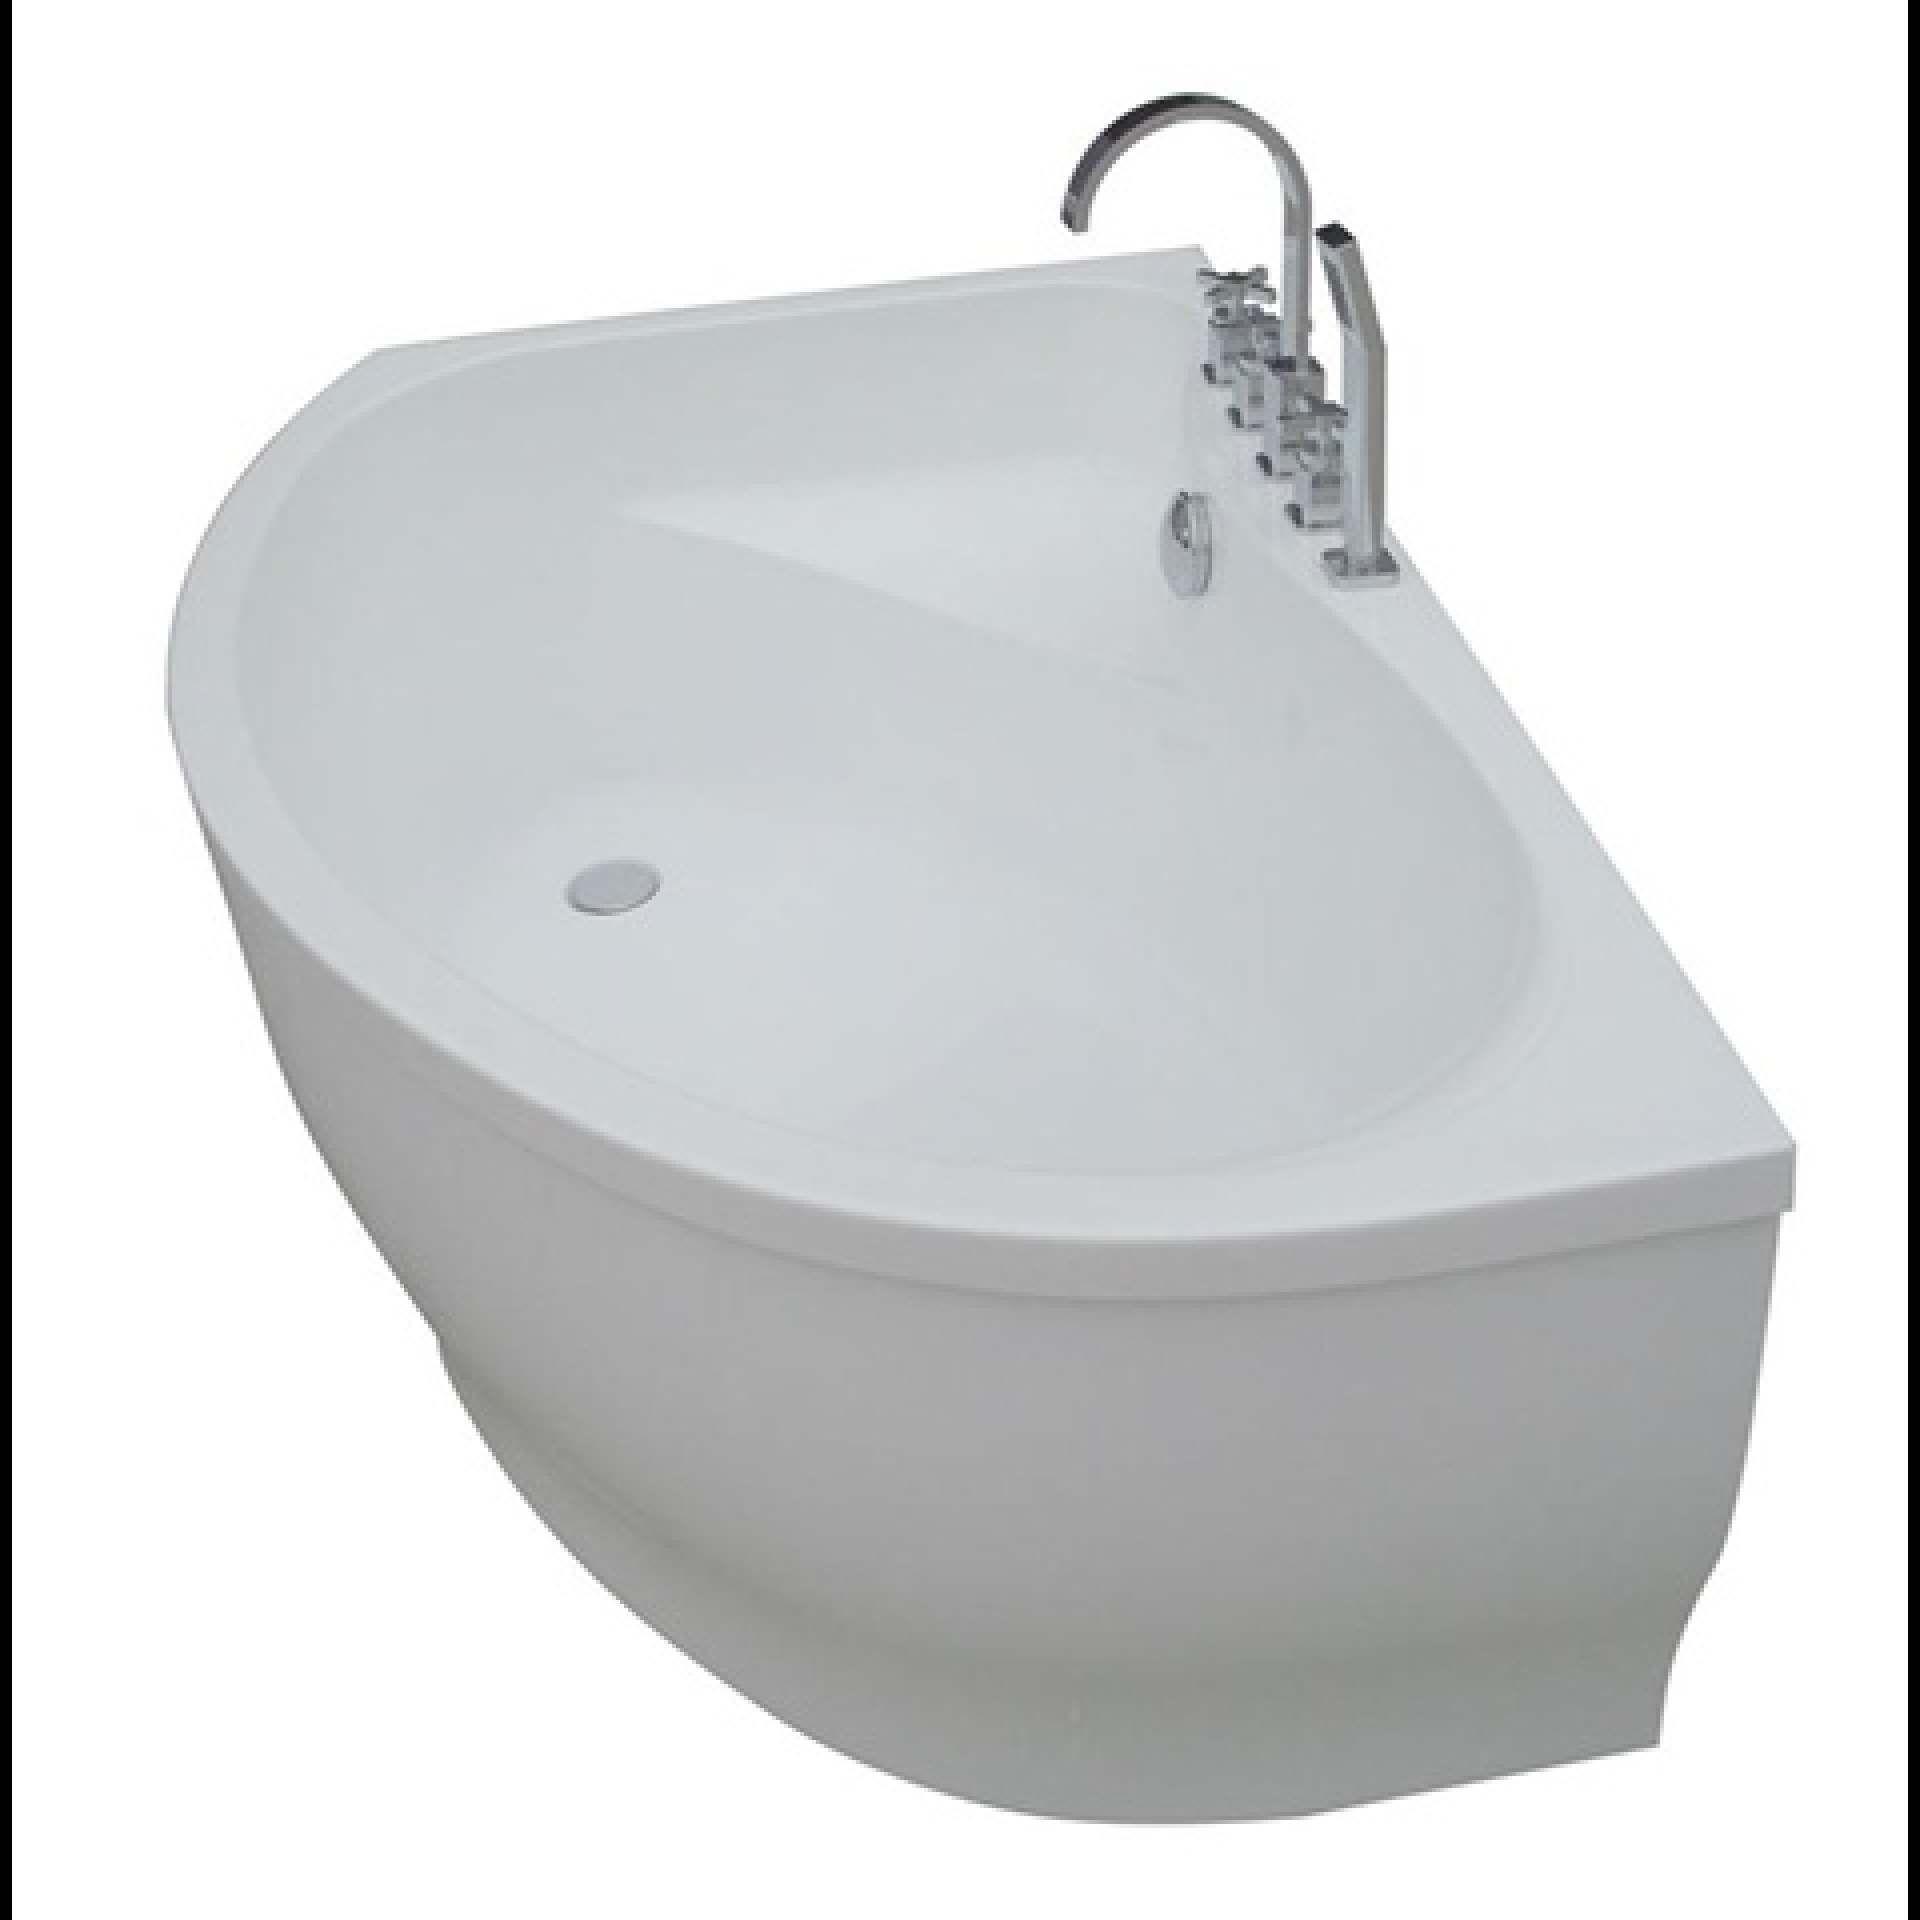 MODA ANGOLO Freestanding Bath 8mm Thick Acrylic Gloss - Product Code ...